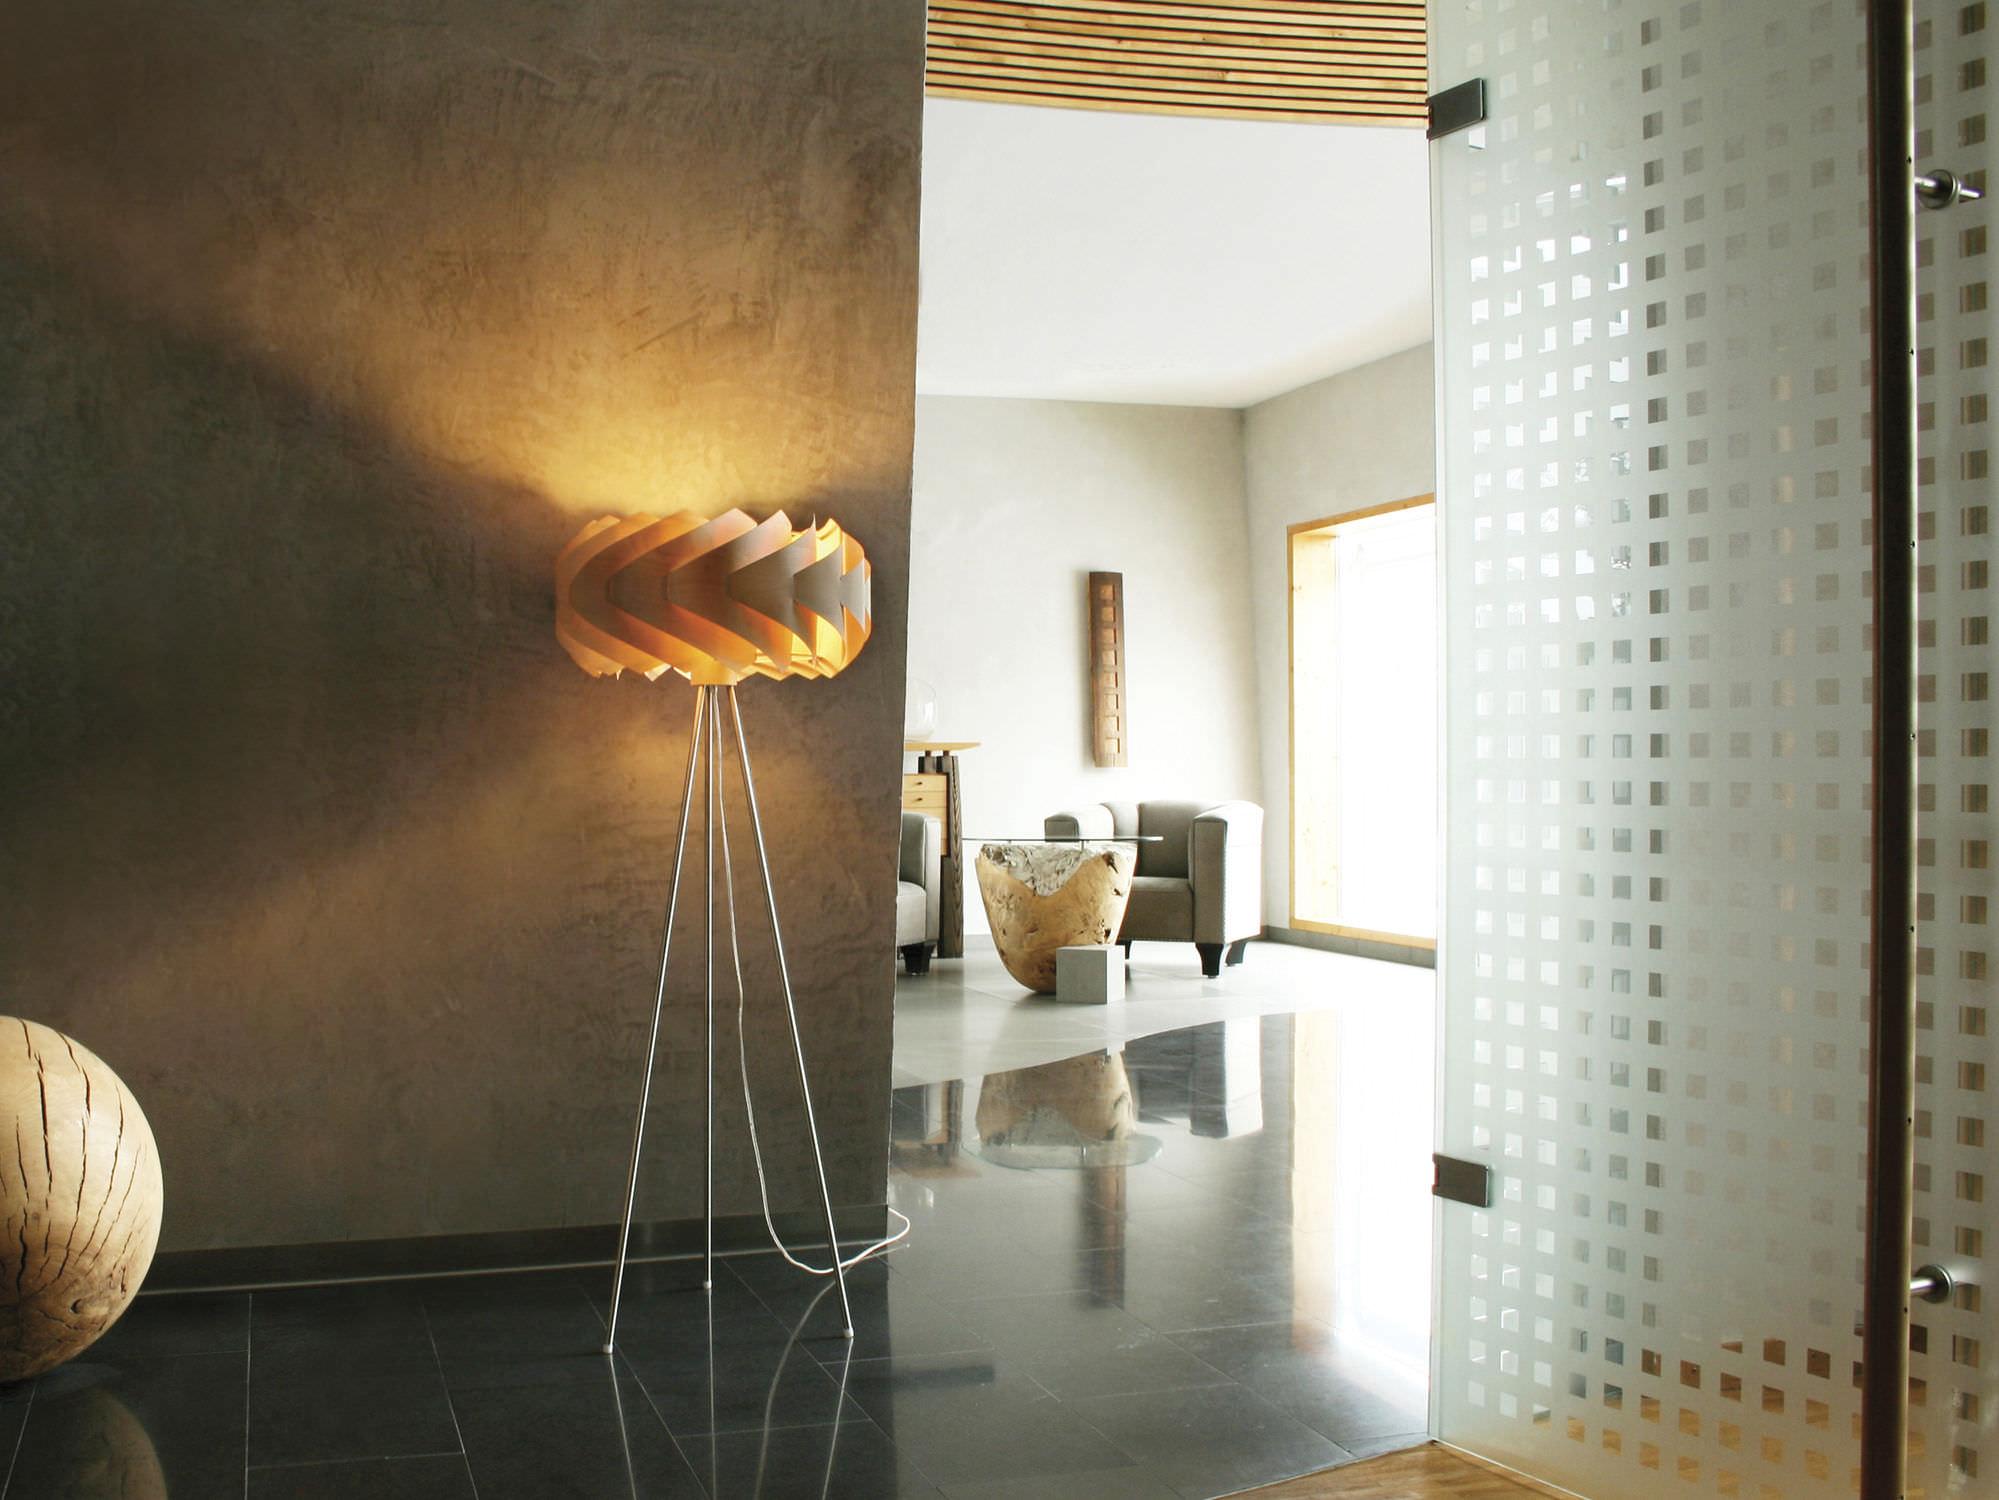 n-etsy-træ-gulv-lampe-træ-gulv-lampe-ikea-træ-gulv-lampe-ireland-træ-gulv-lamper-Indien-træ-stativ-gulv-lampe-ireland-træ-gulv-lampe- basis-ikea-industrielle-træ-gulv-lampe-levende-j